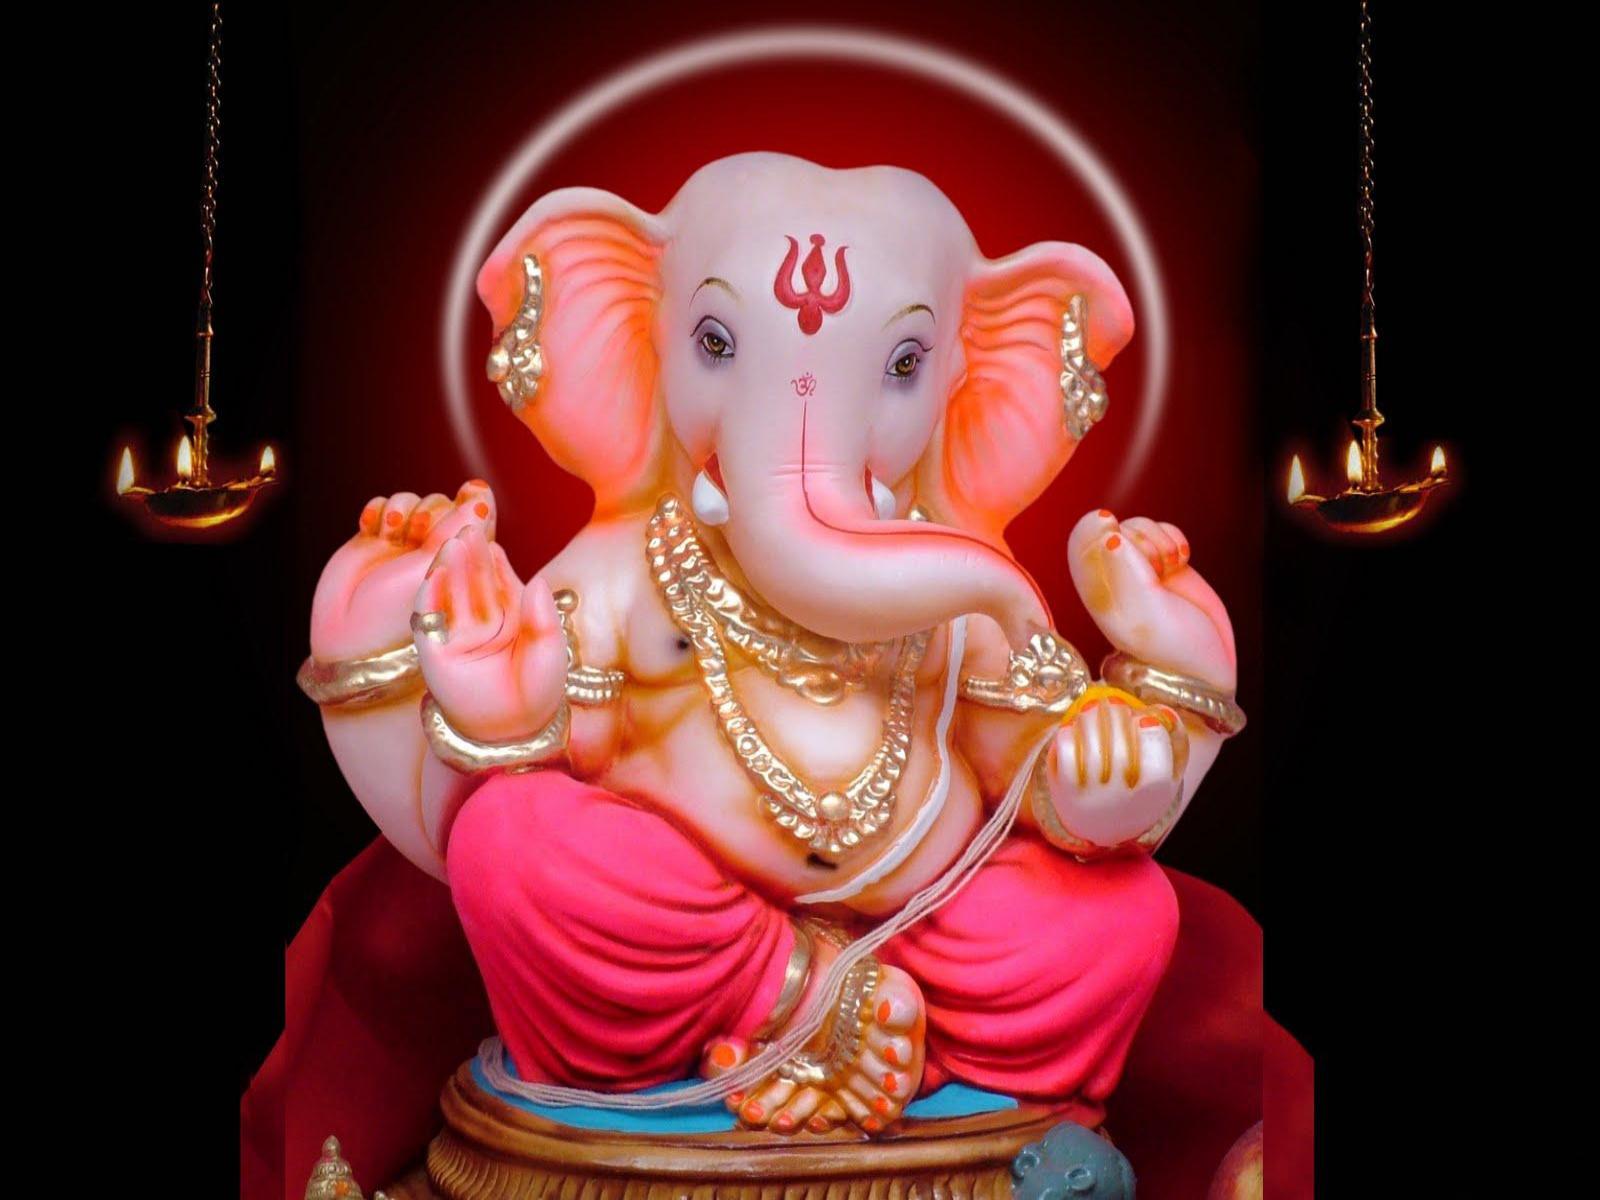 Ravishment Lord Ganesha